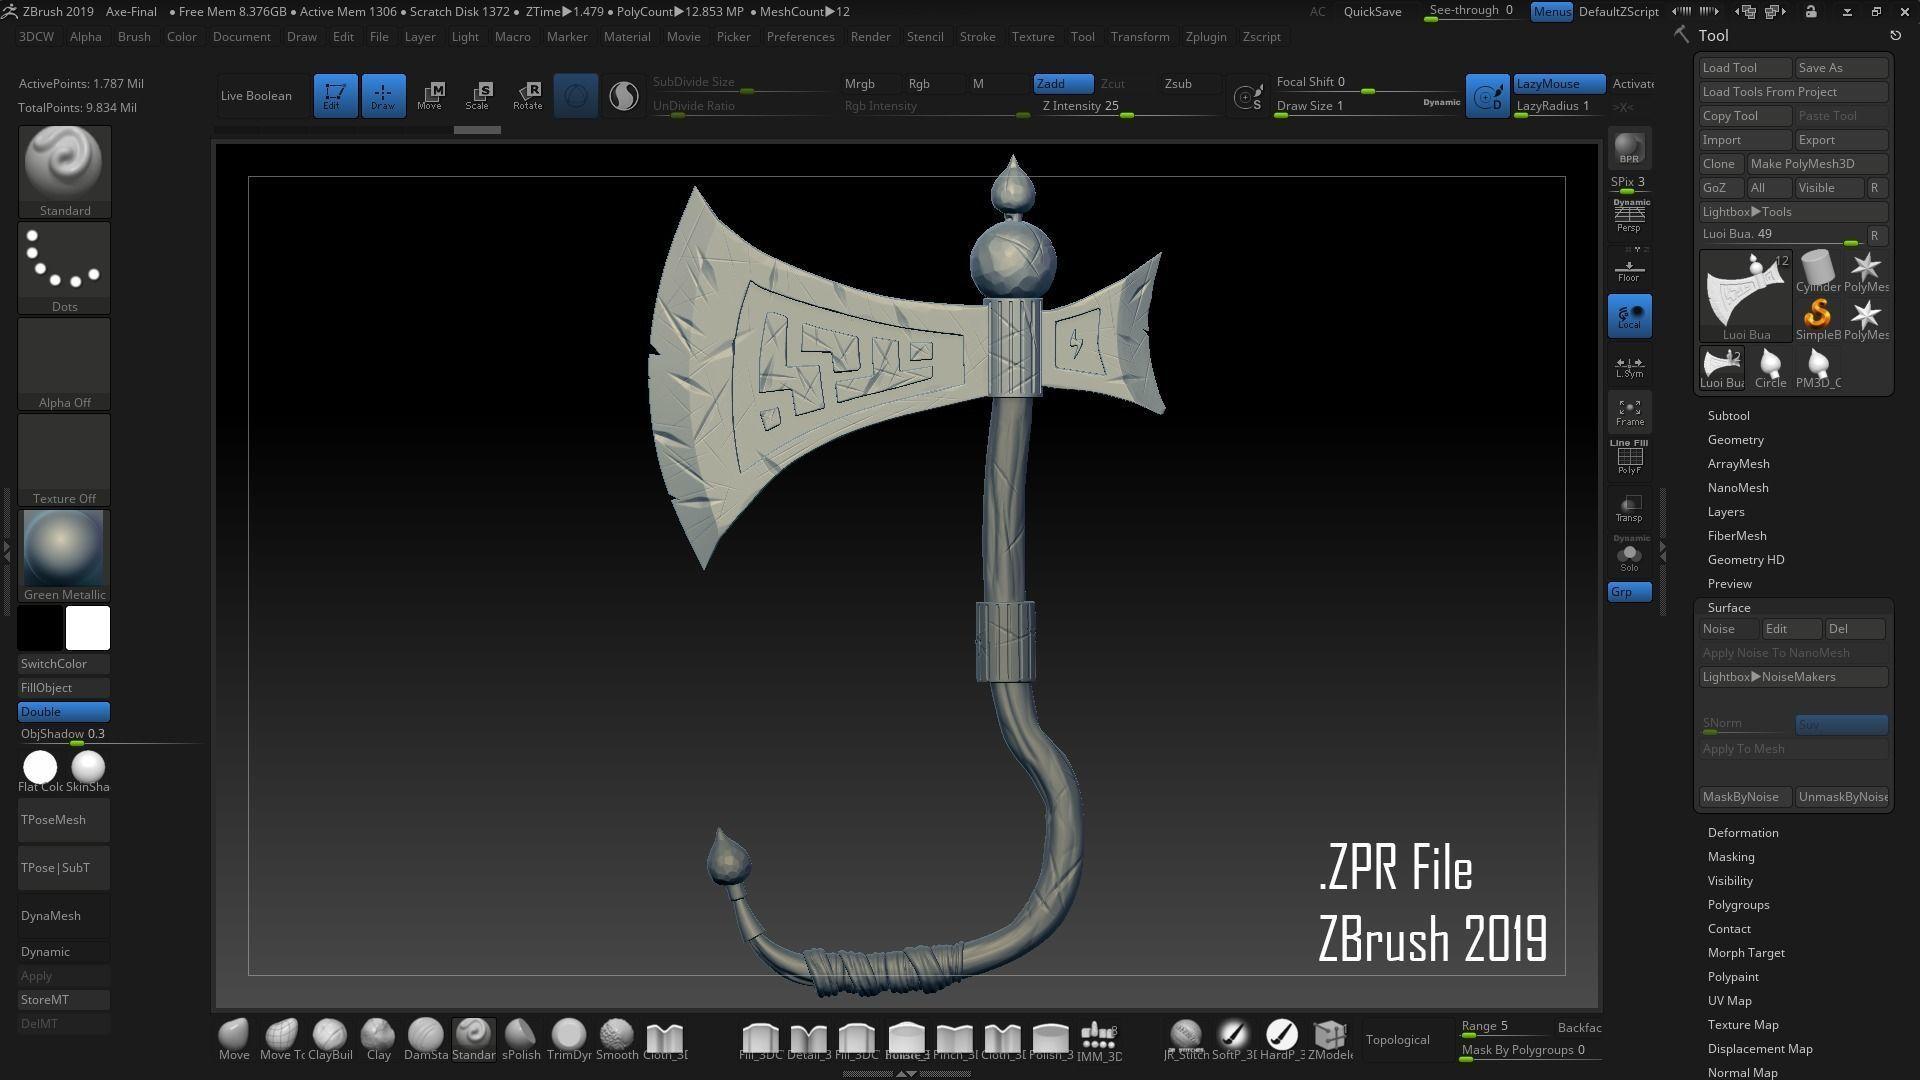 Axe - Sculpting in ZBrush - Retopo and Texture Blender Eevee | 3D model